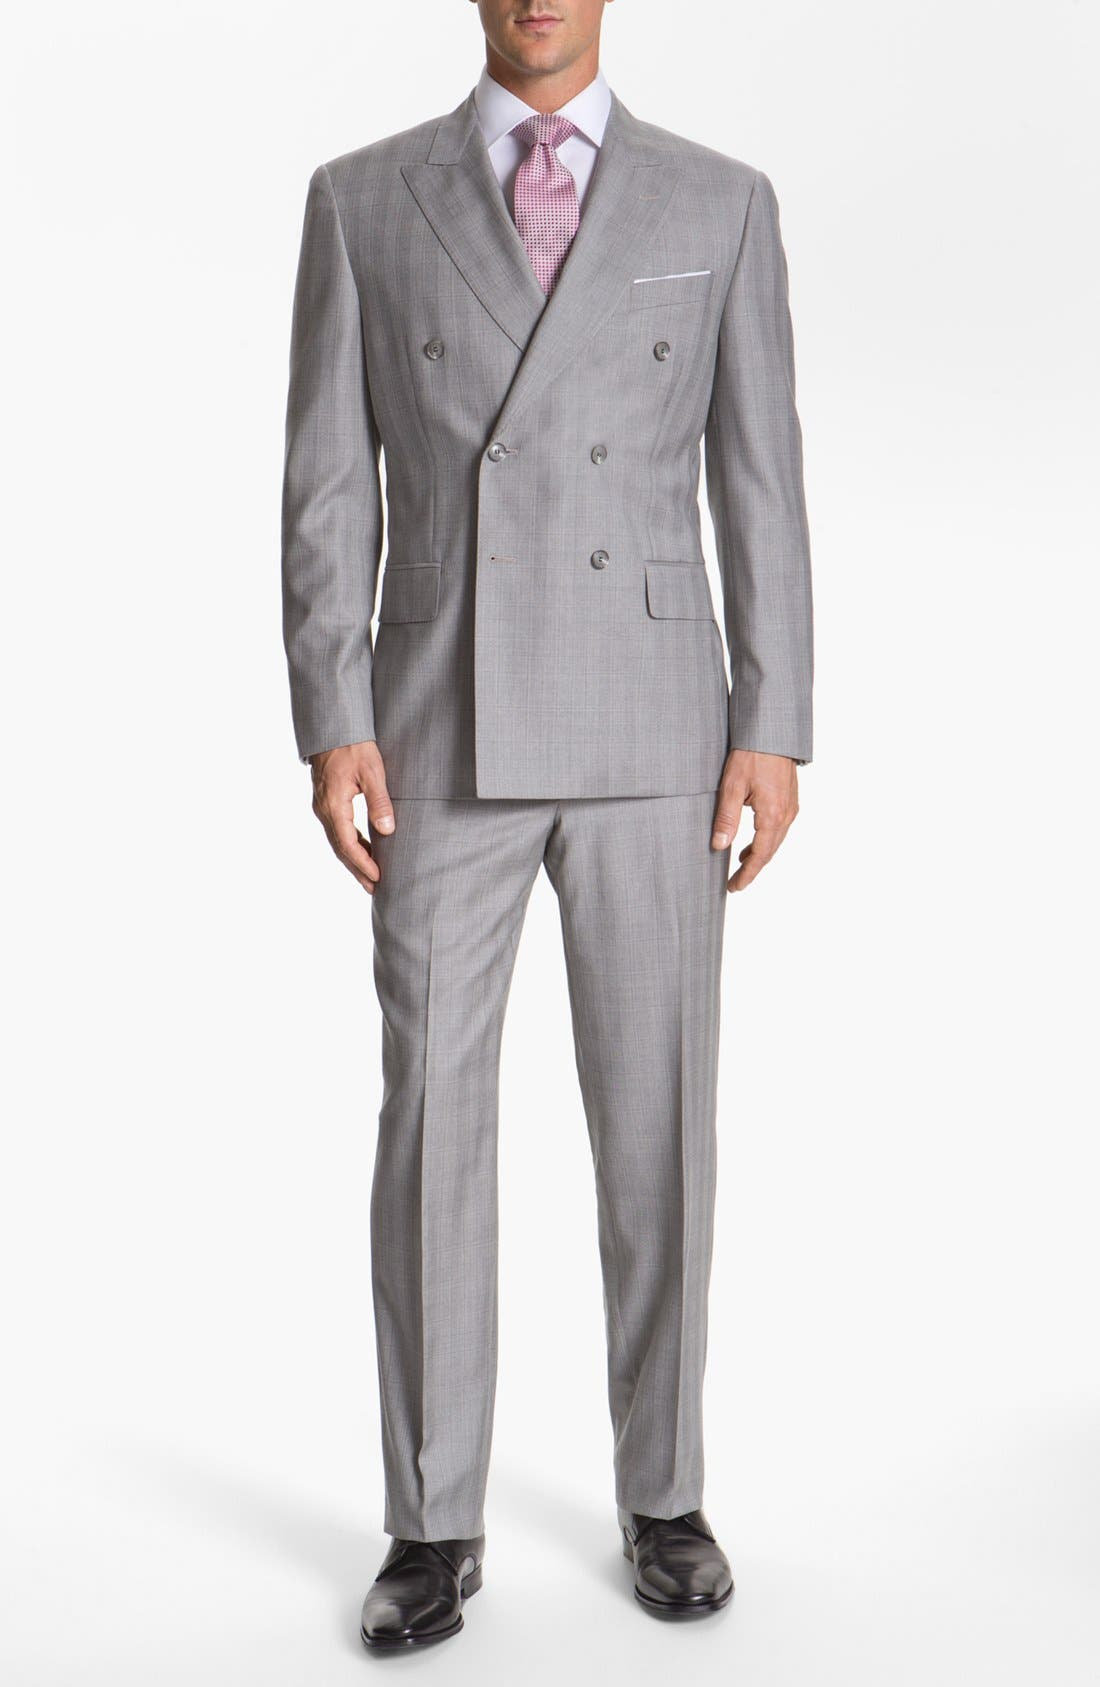 JOSEPH ABBOUD 'Platinum' Double Breasted Suit, Main, color, 050